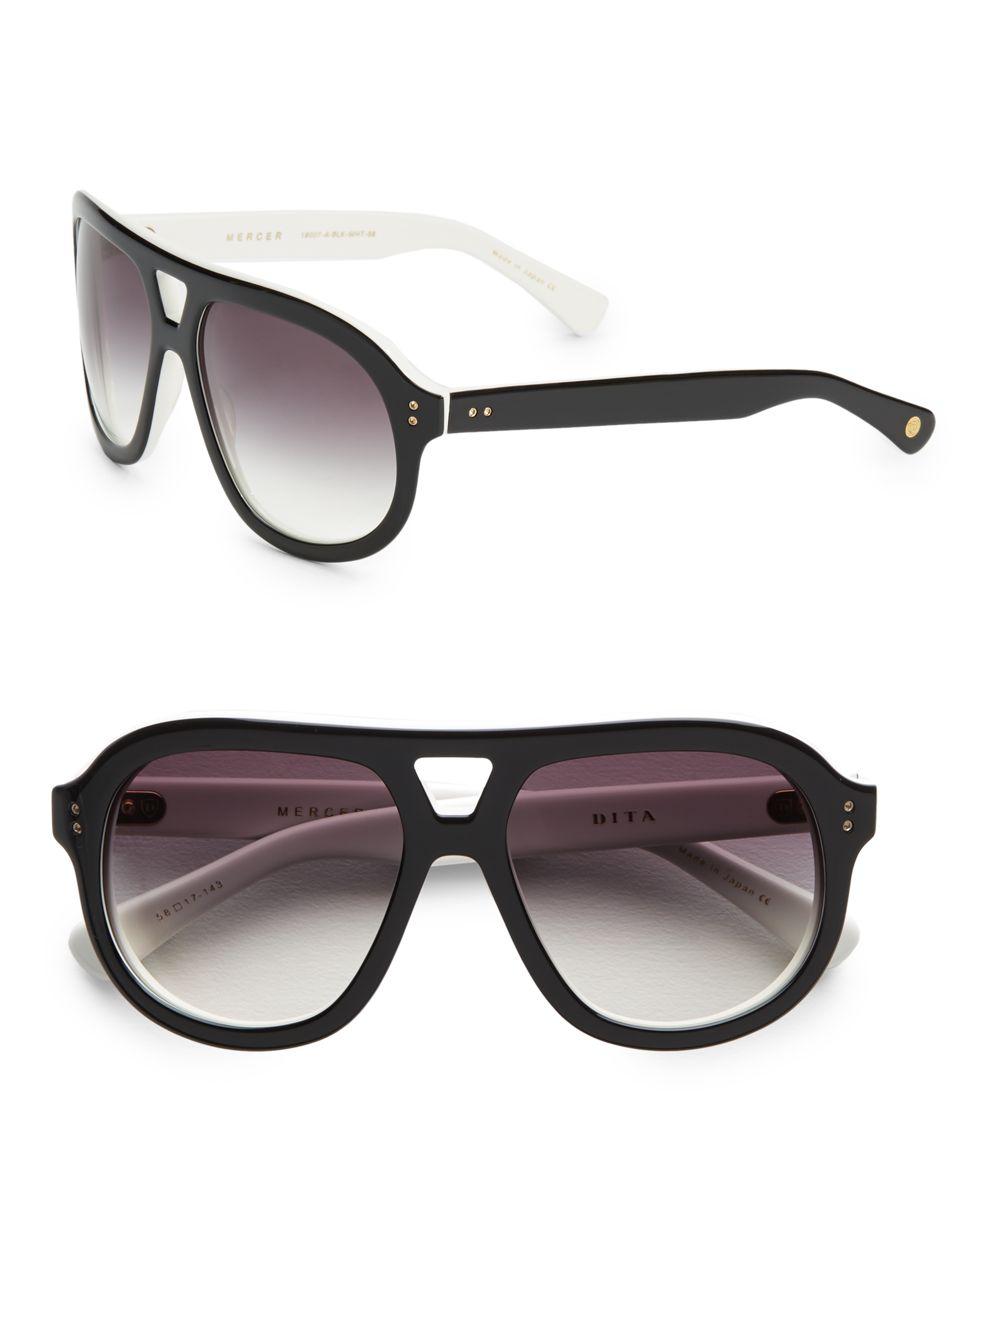 64a45a074a4d Lyst - Dita Eyewear Mercer Acetate Aviator Sunglasses in Gray